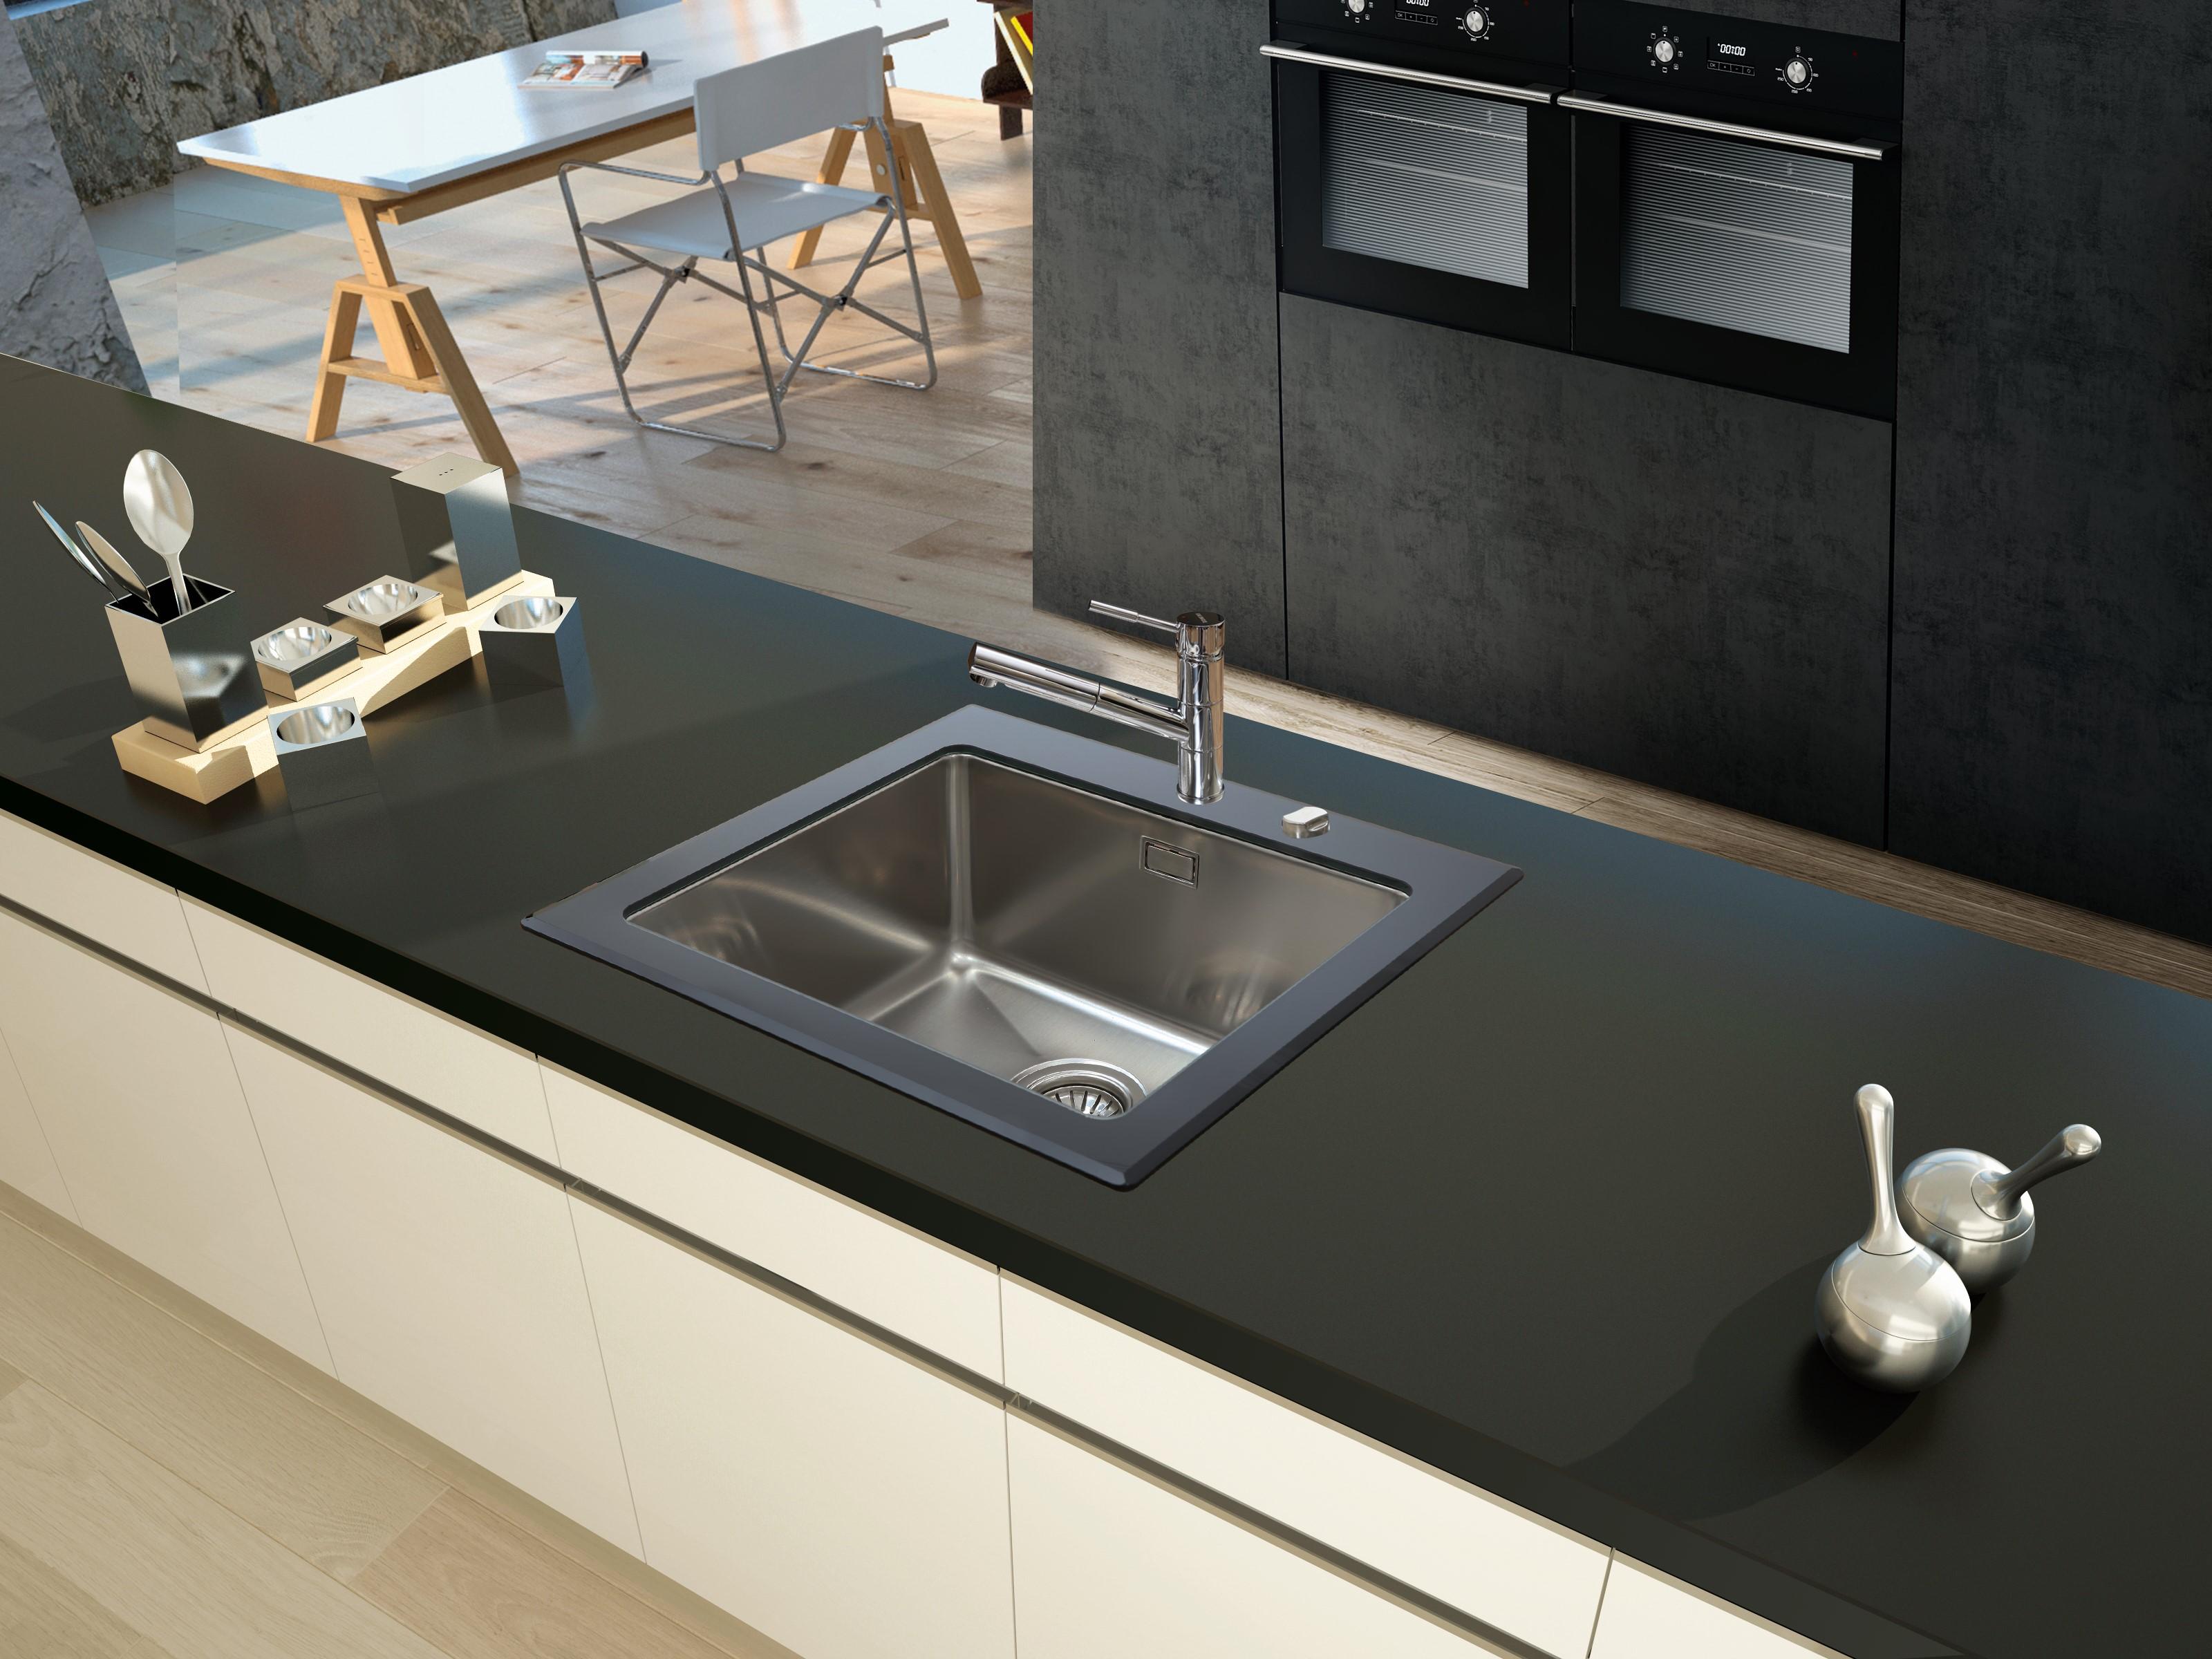 respekta Spüle Einbauspüle Glasspüle Küchenspüle Glas Edelstahl 55 x 53 schwarz